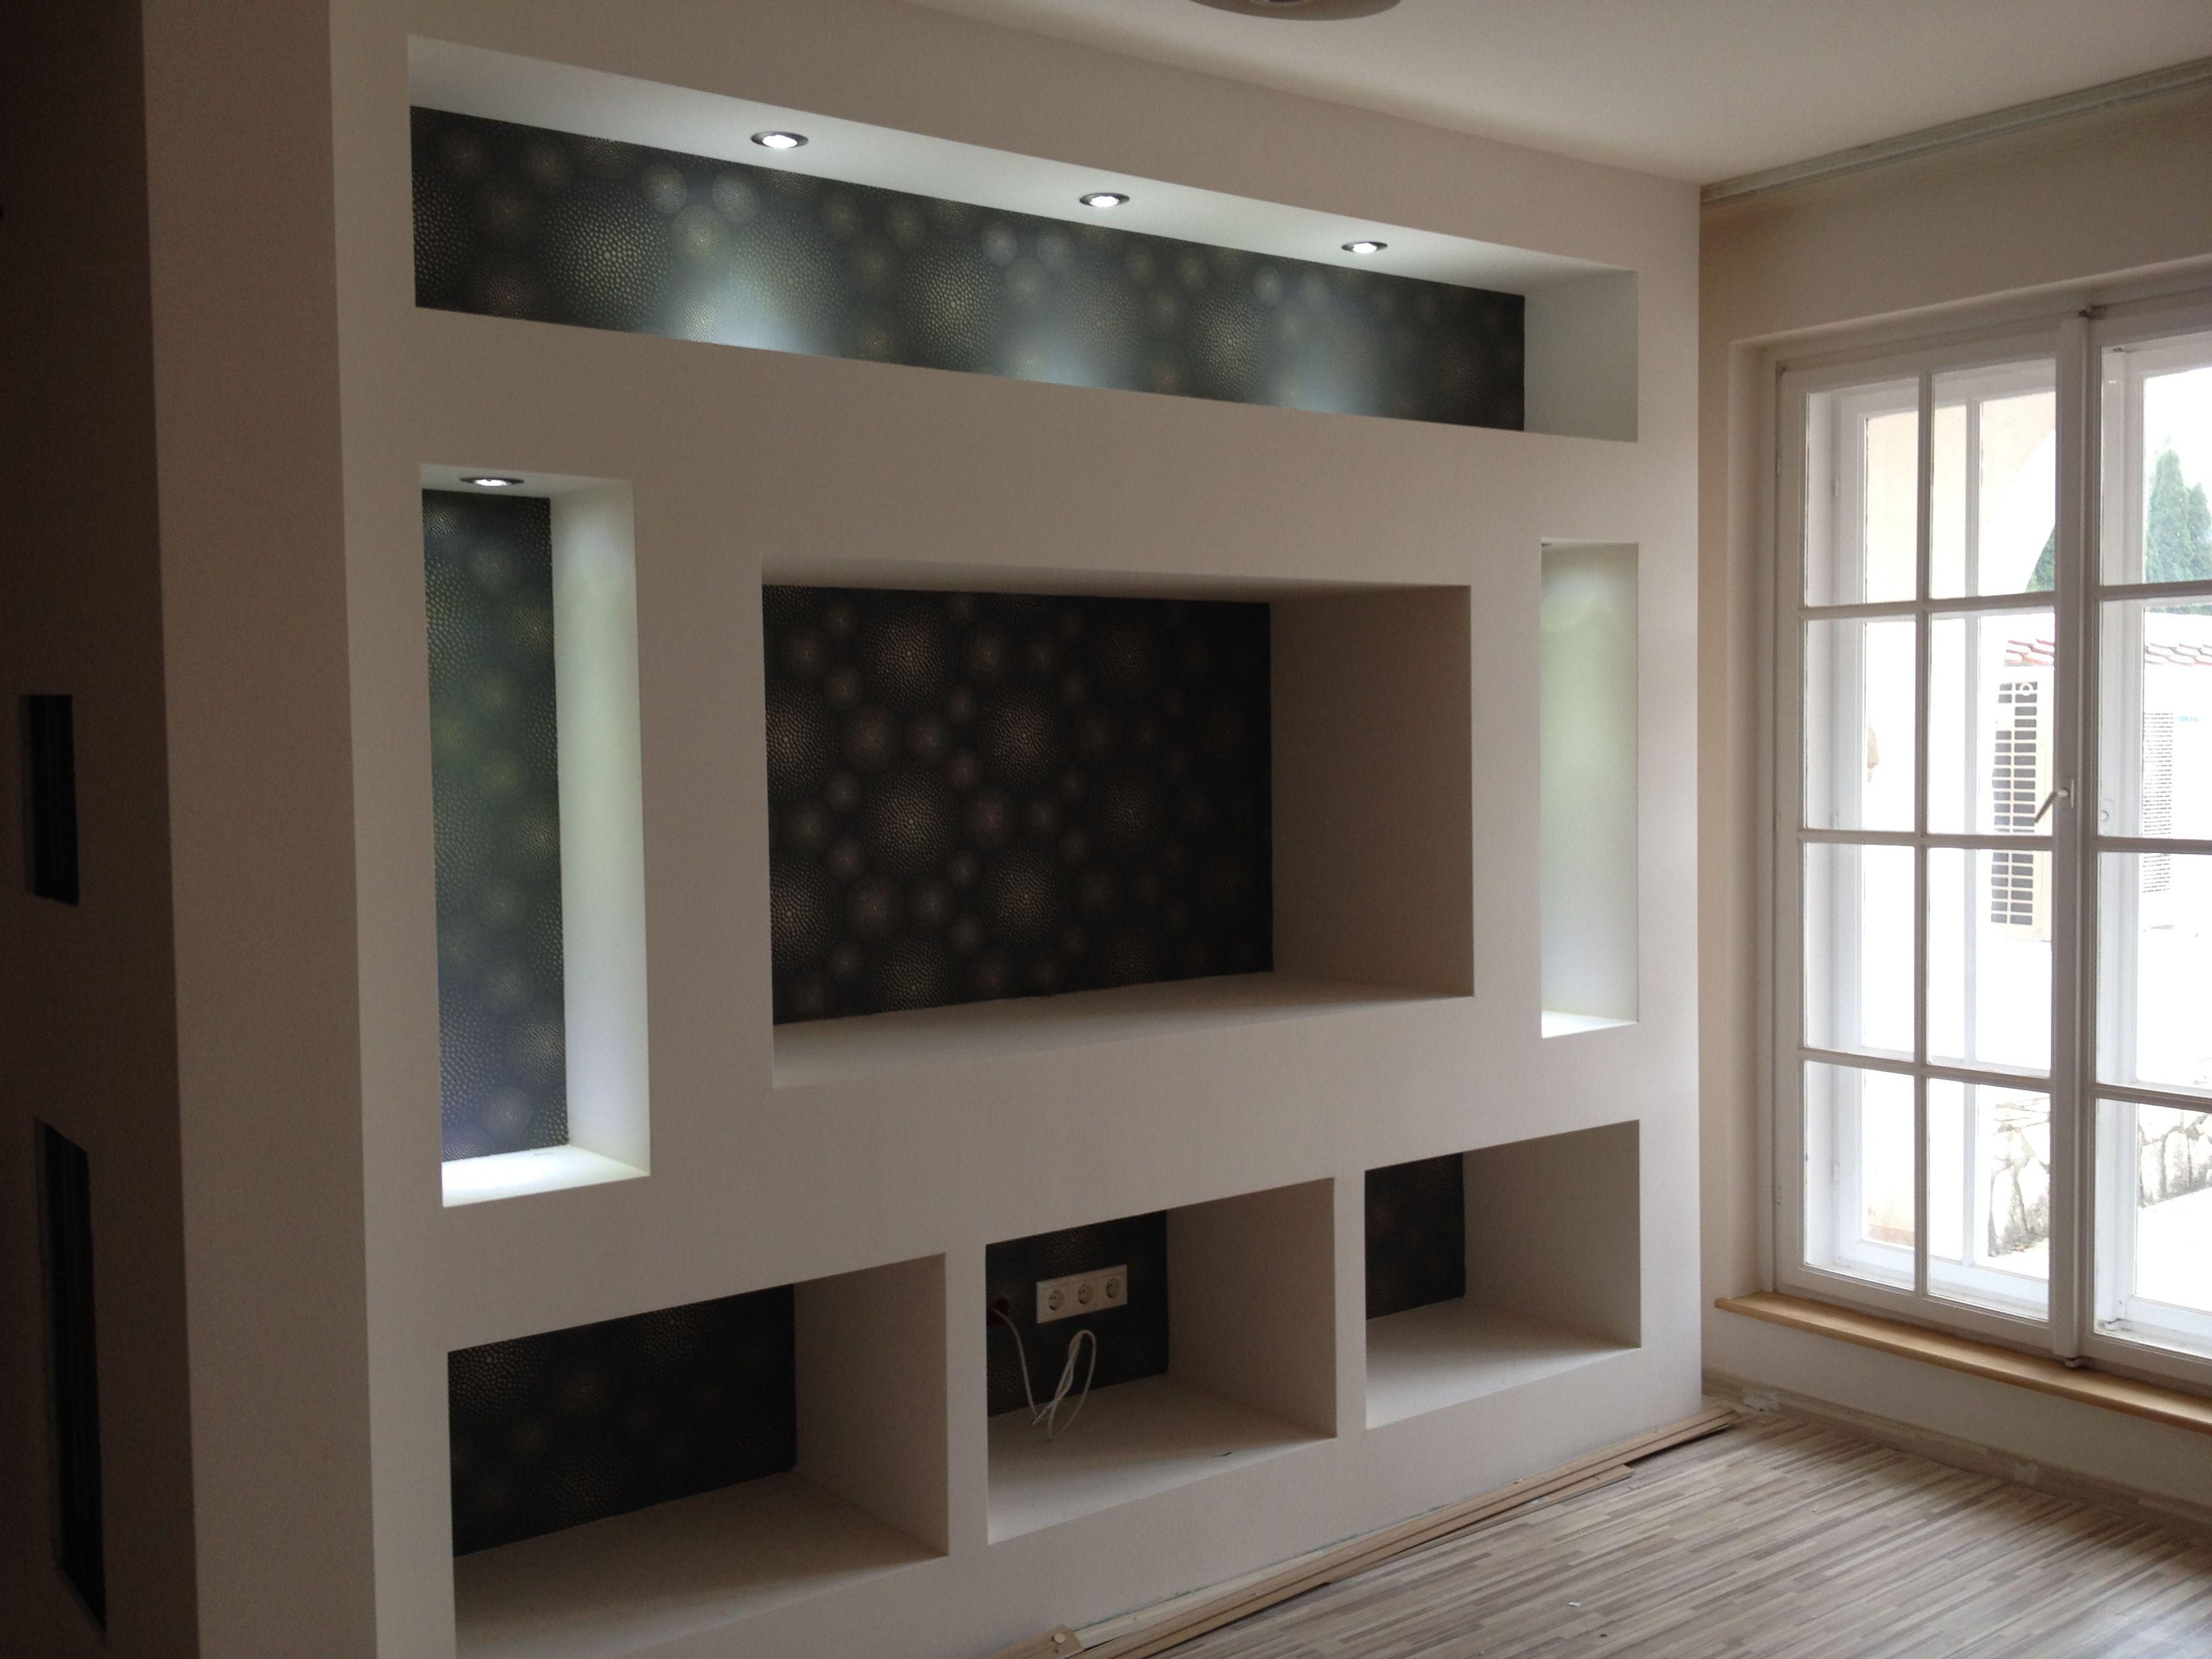 Muebles Lcd Decoraci N De Casa Pinterest Tvs Tv Walls And  -> Estante Gesso Sala Tv